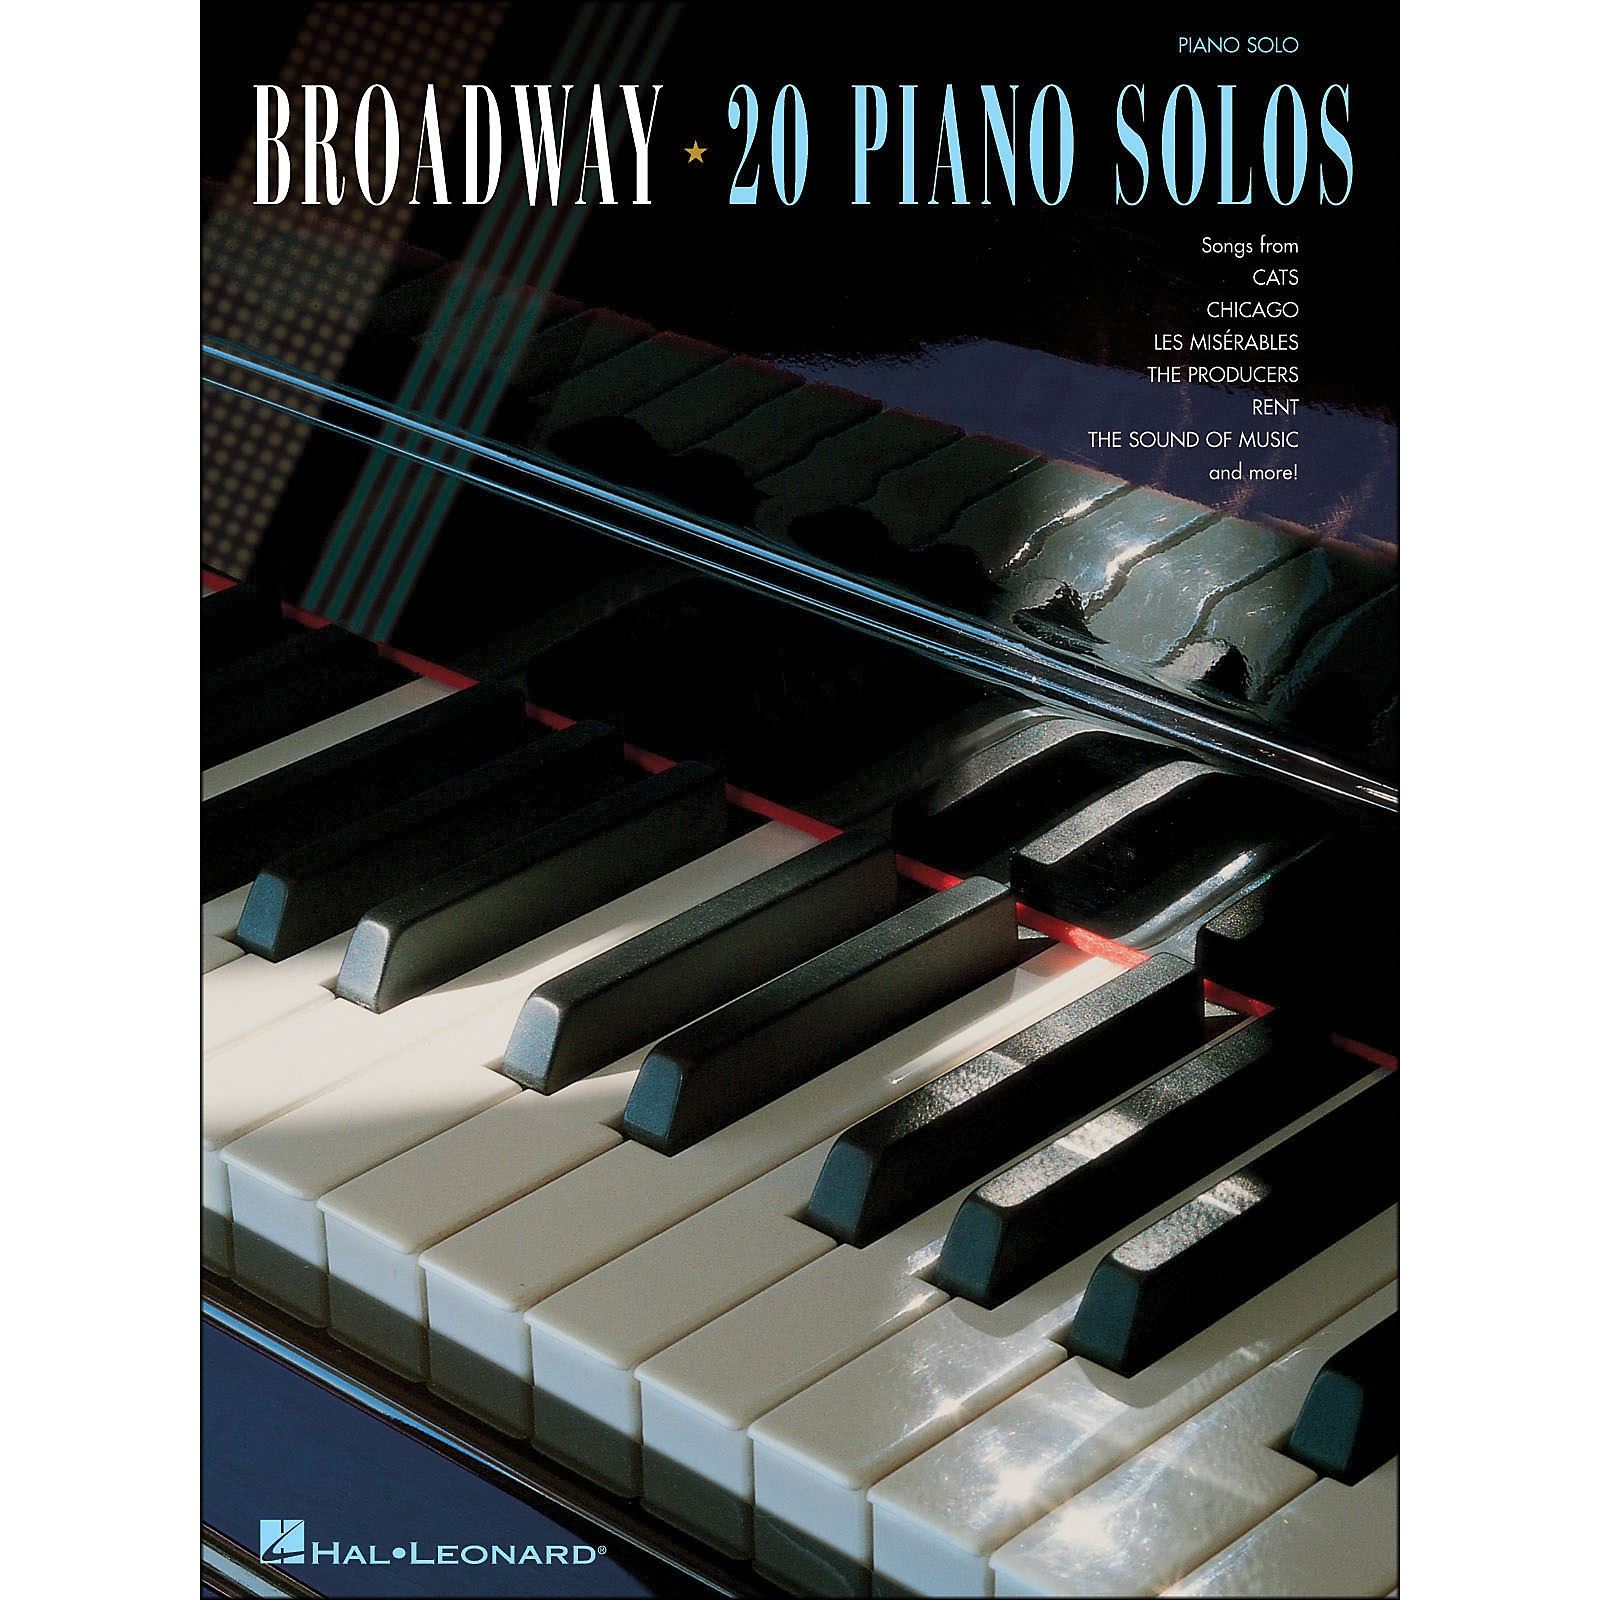 Hal Leonard Broadway - 20 Piano Solos